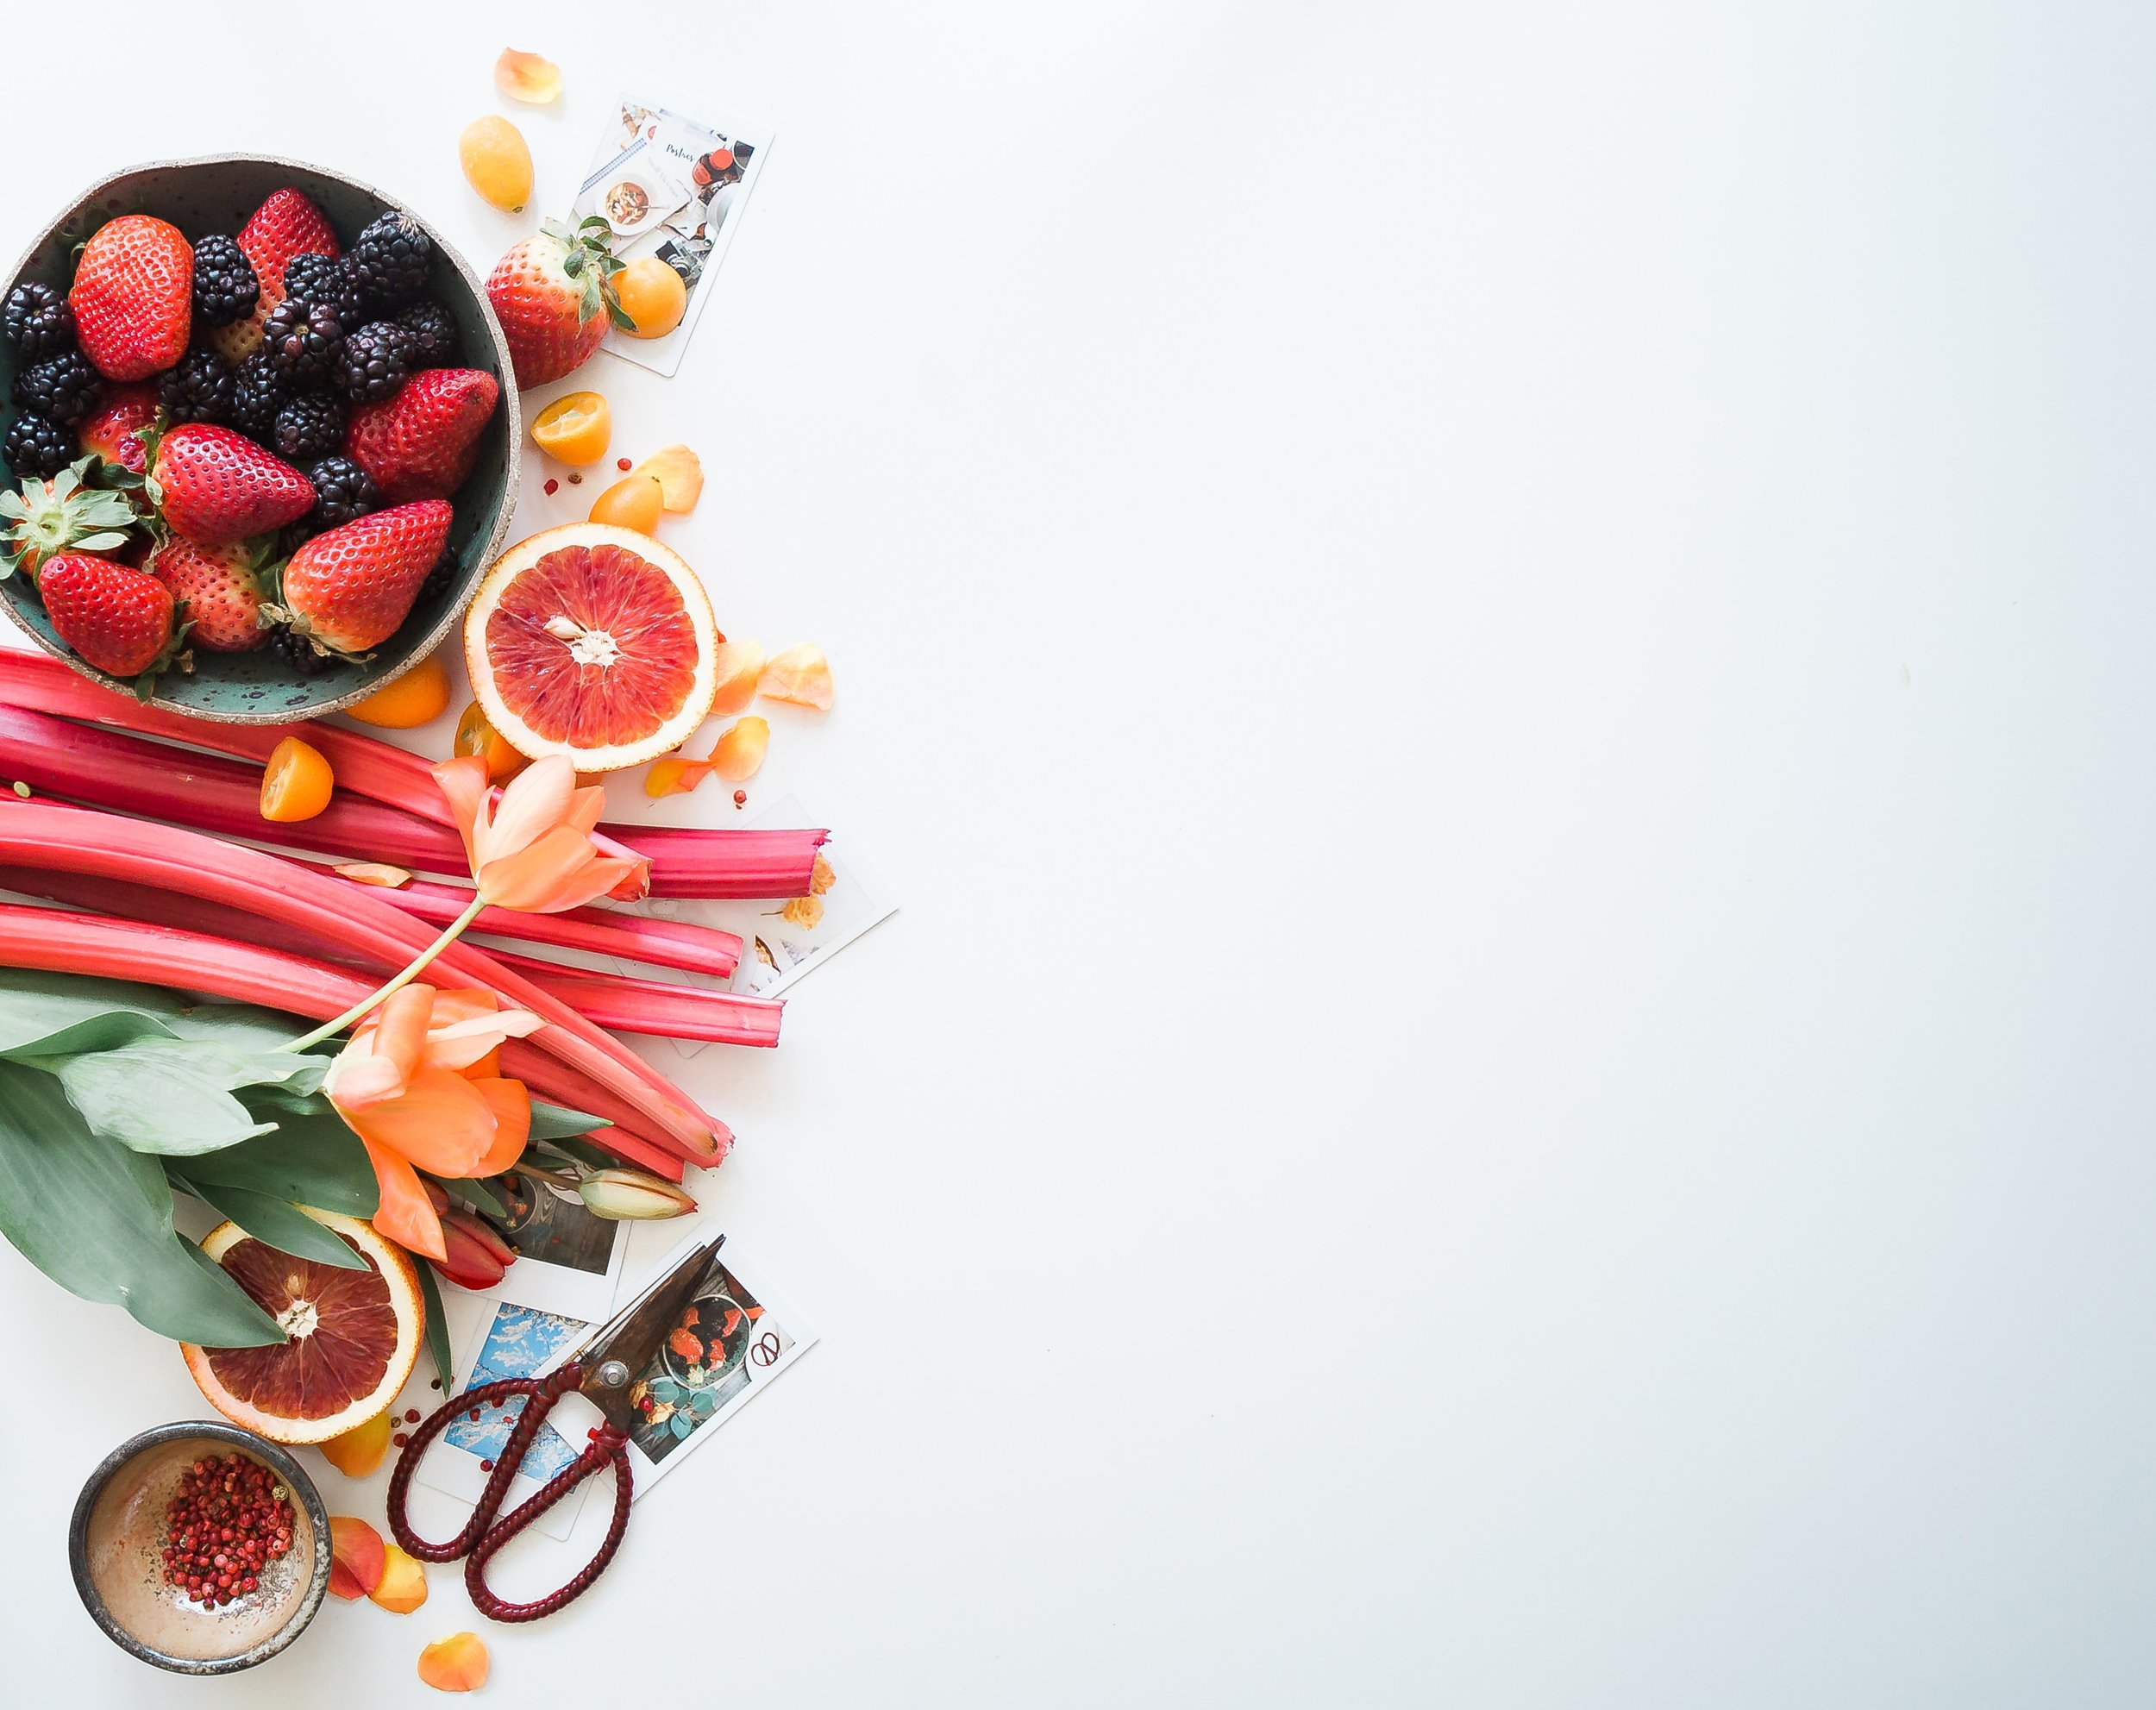 Bowl of berries and rhubarb